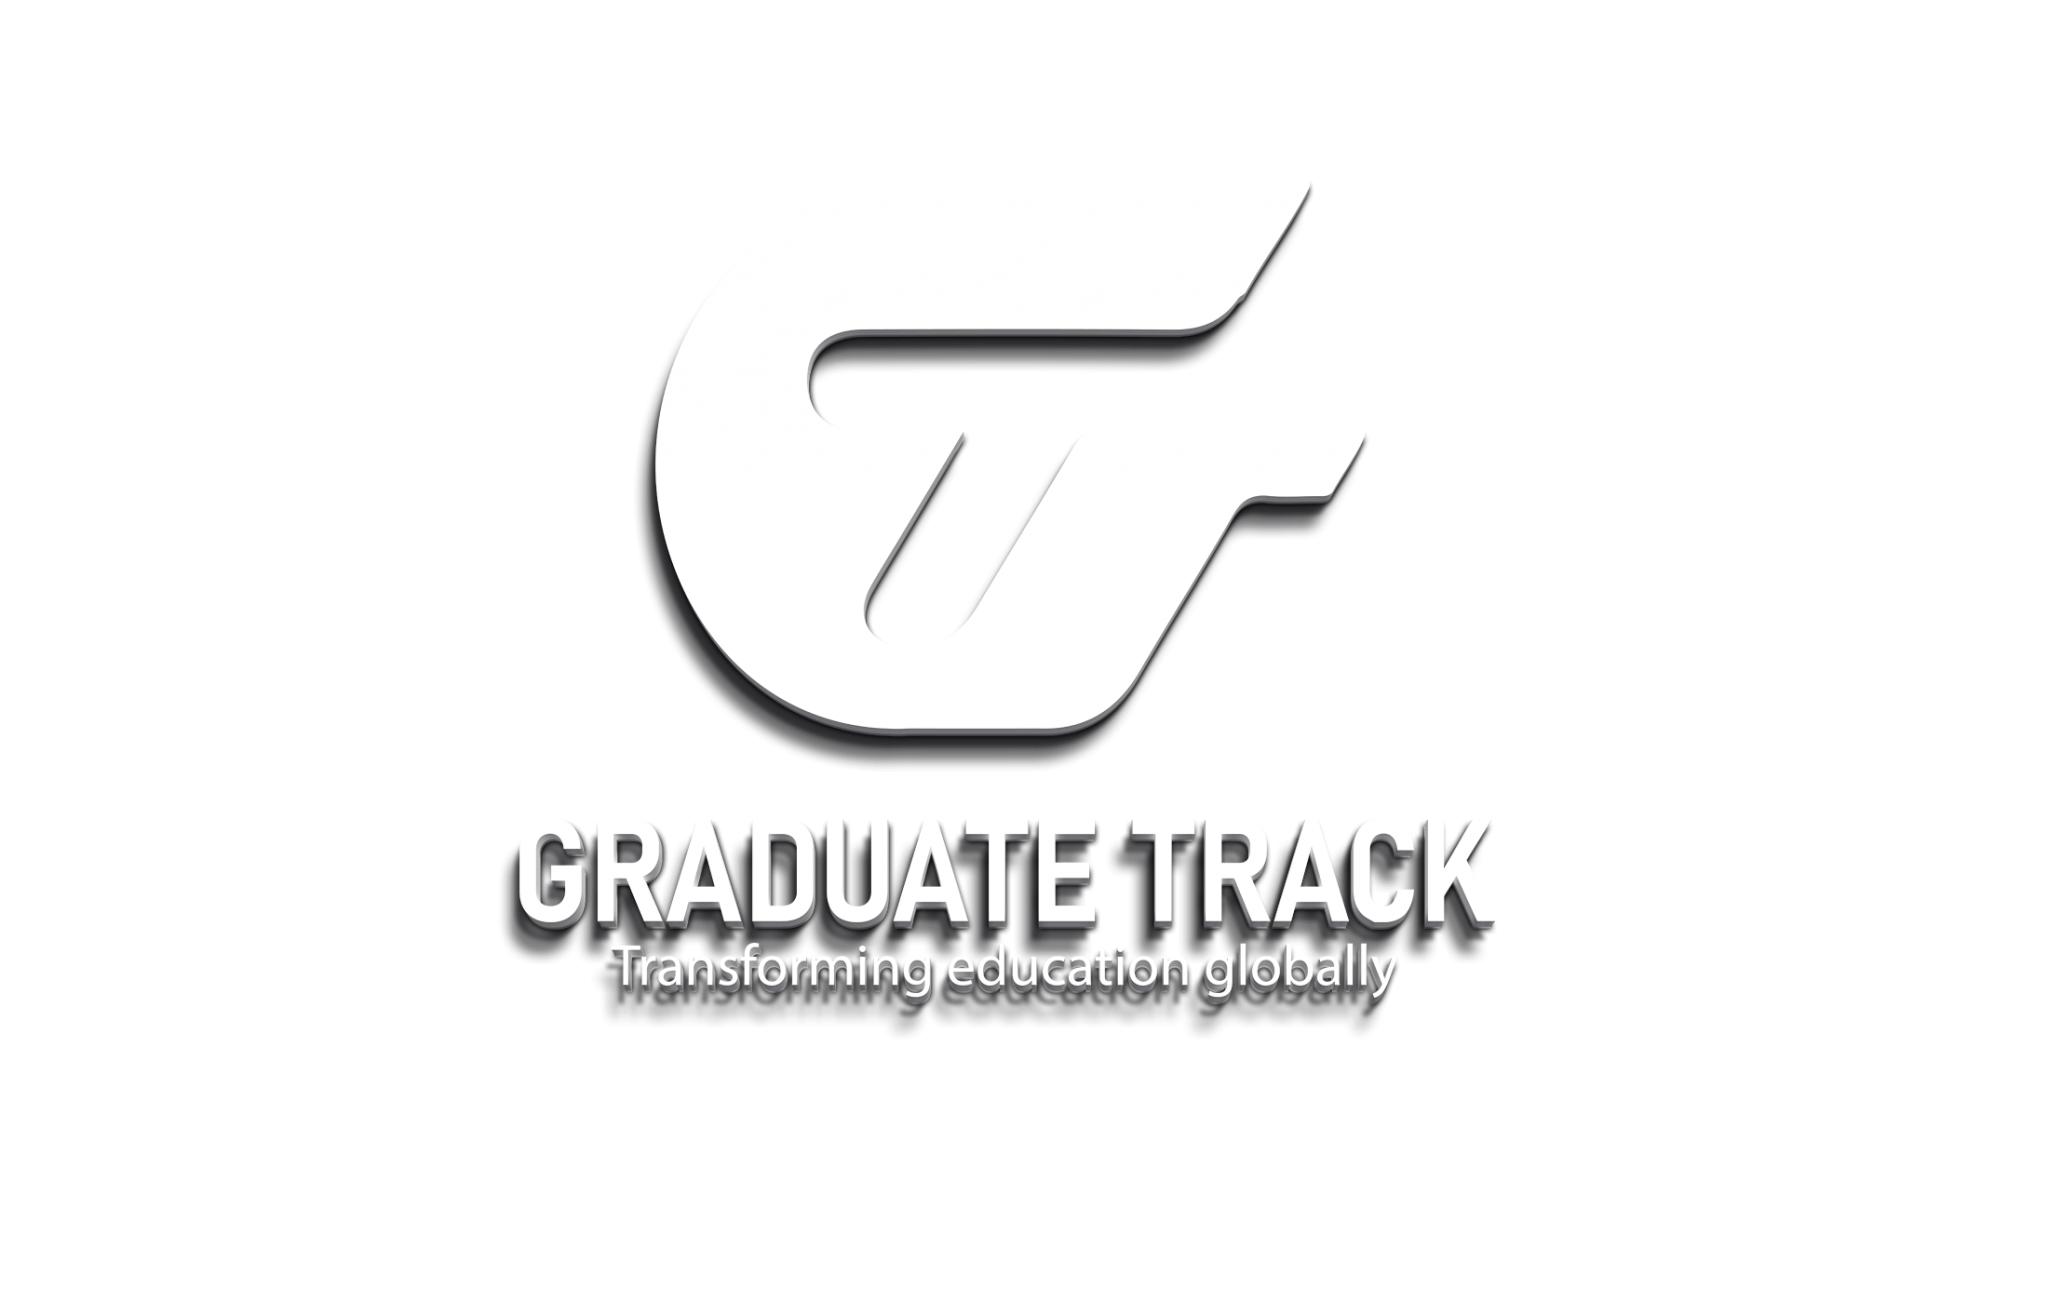 Graduate Track